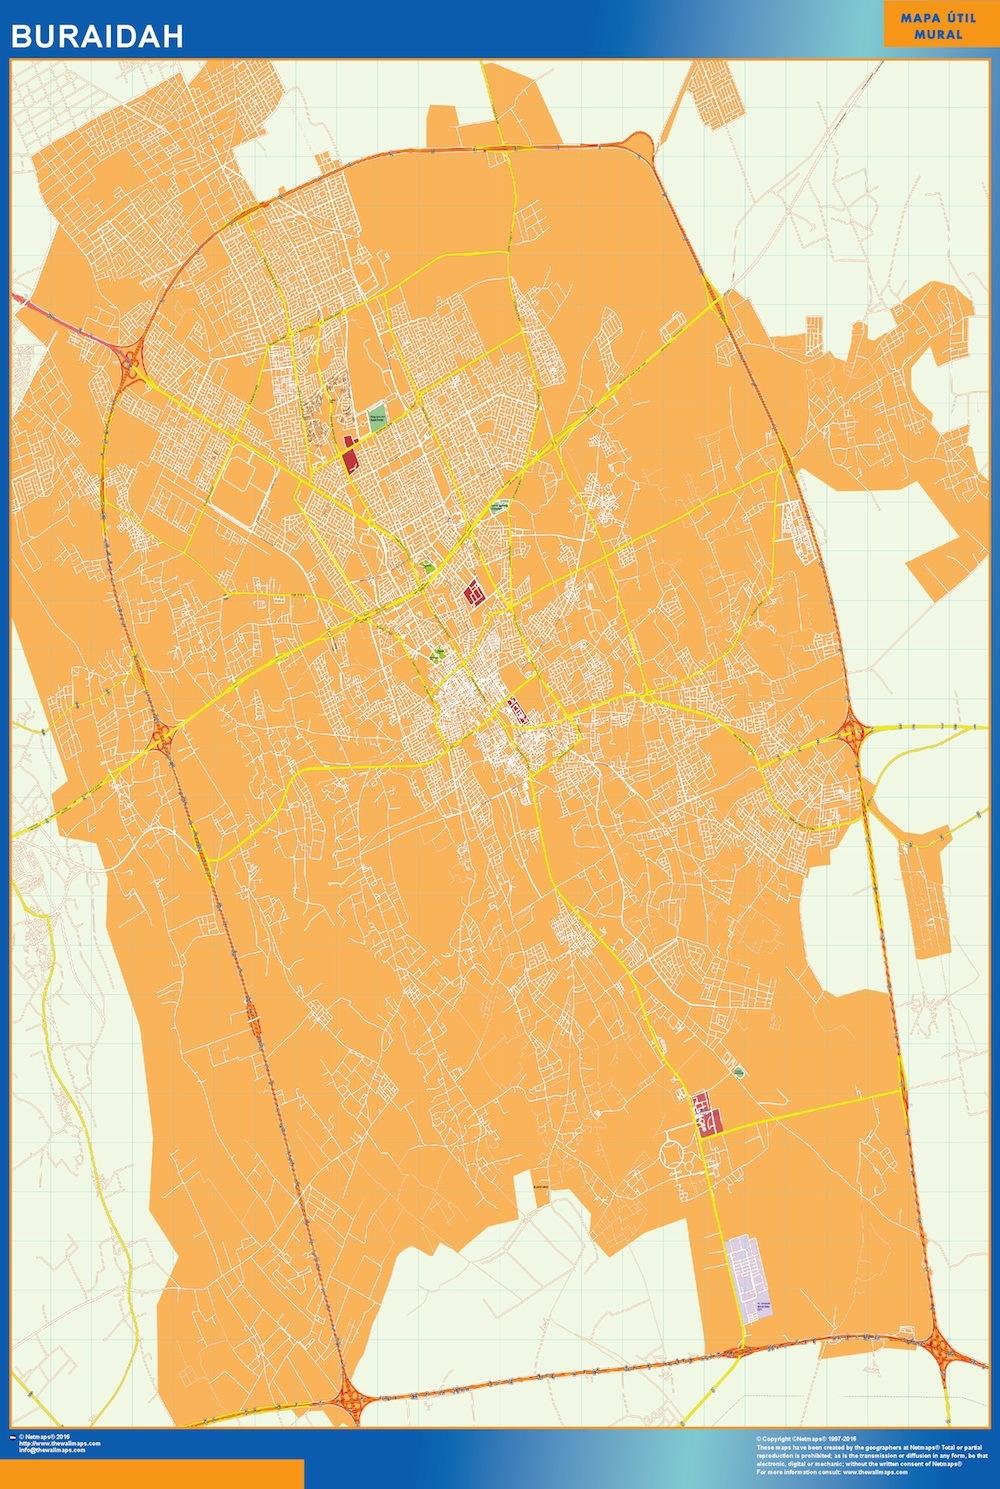 Mapa Buraidah en Arabia Saudita plastificado gigante